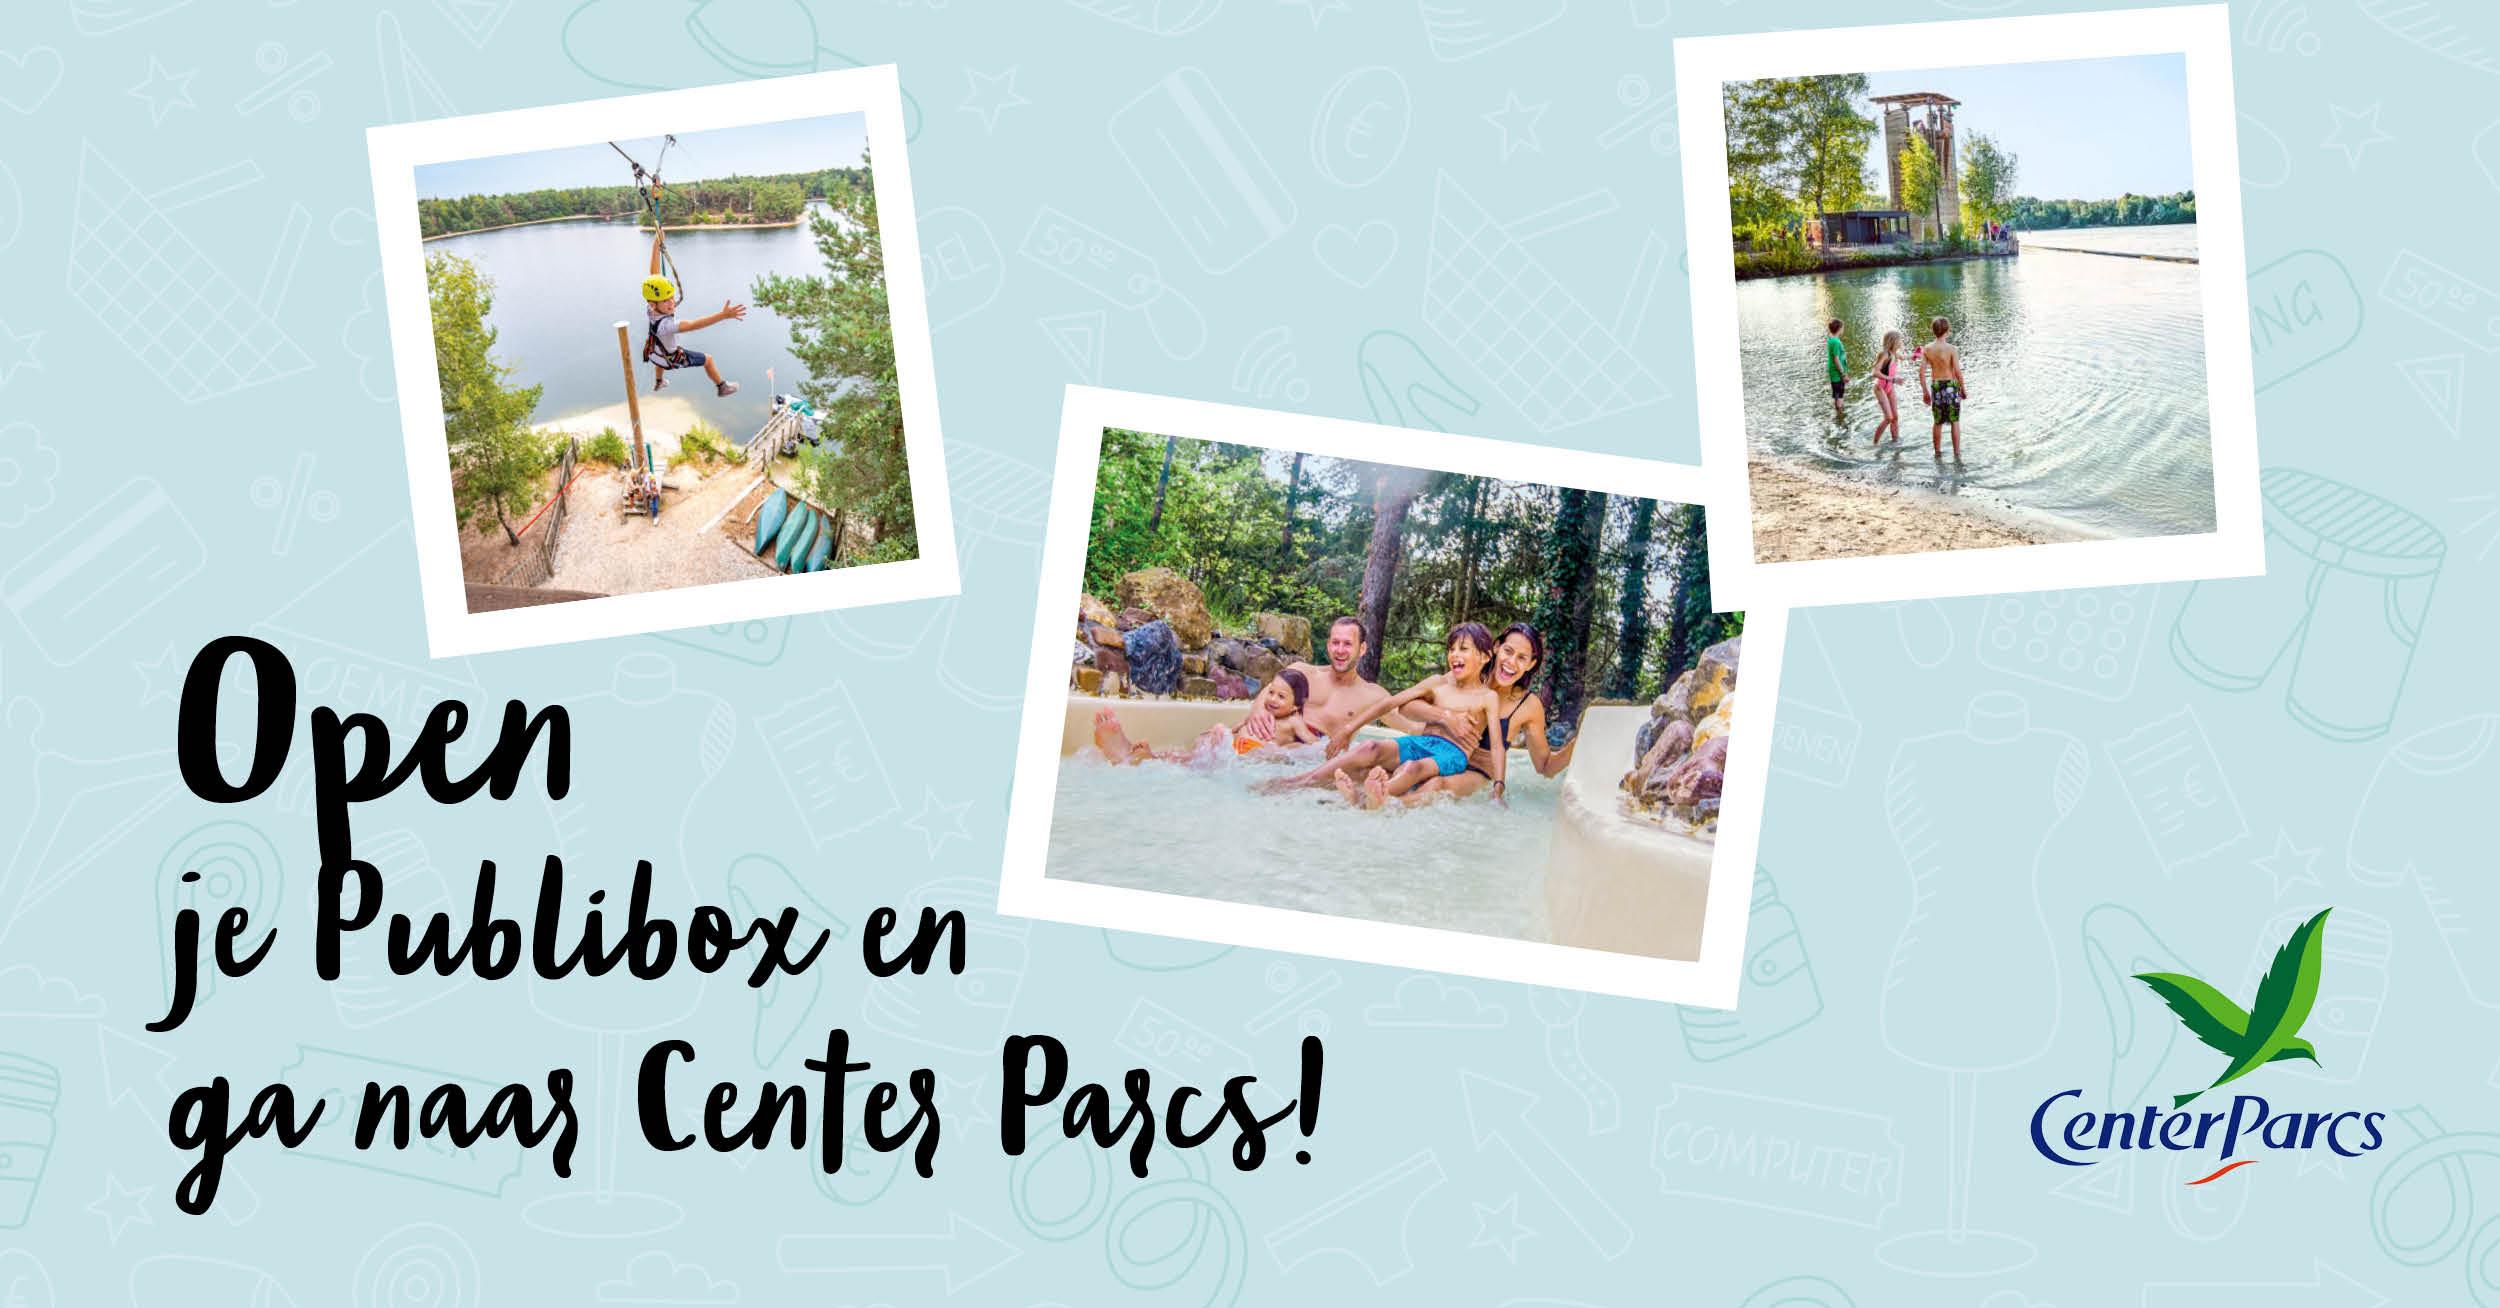 Facebookpost Center Parcs 1200x628.jpg